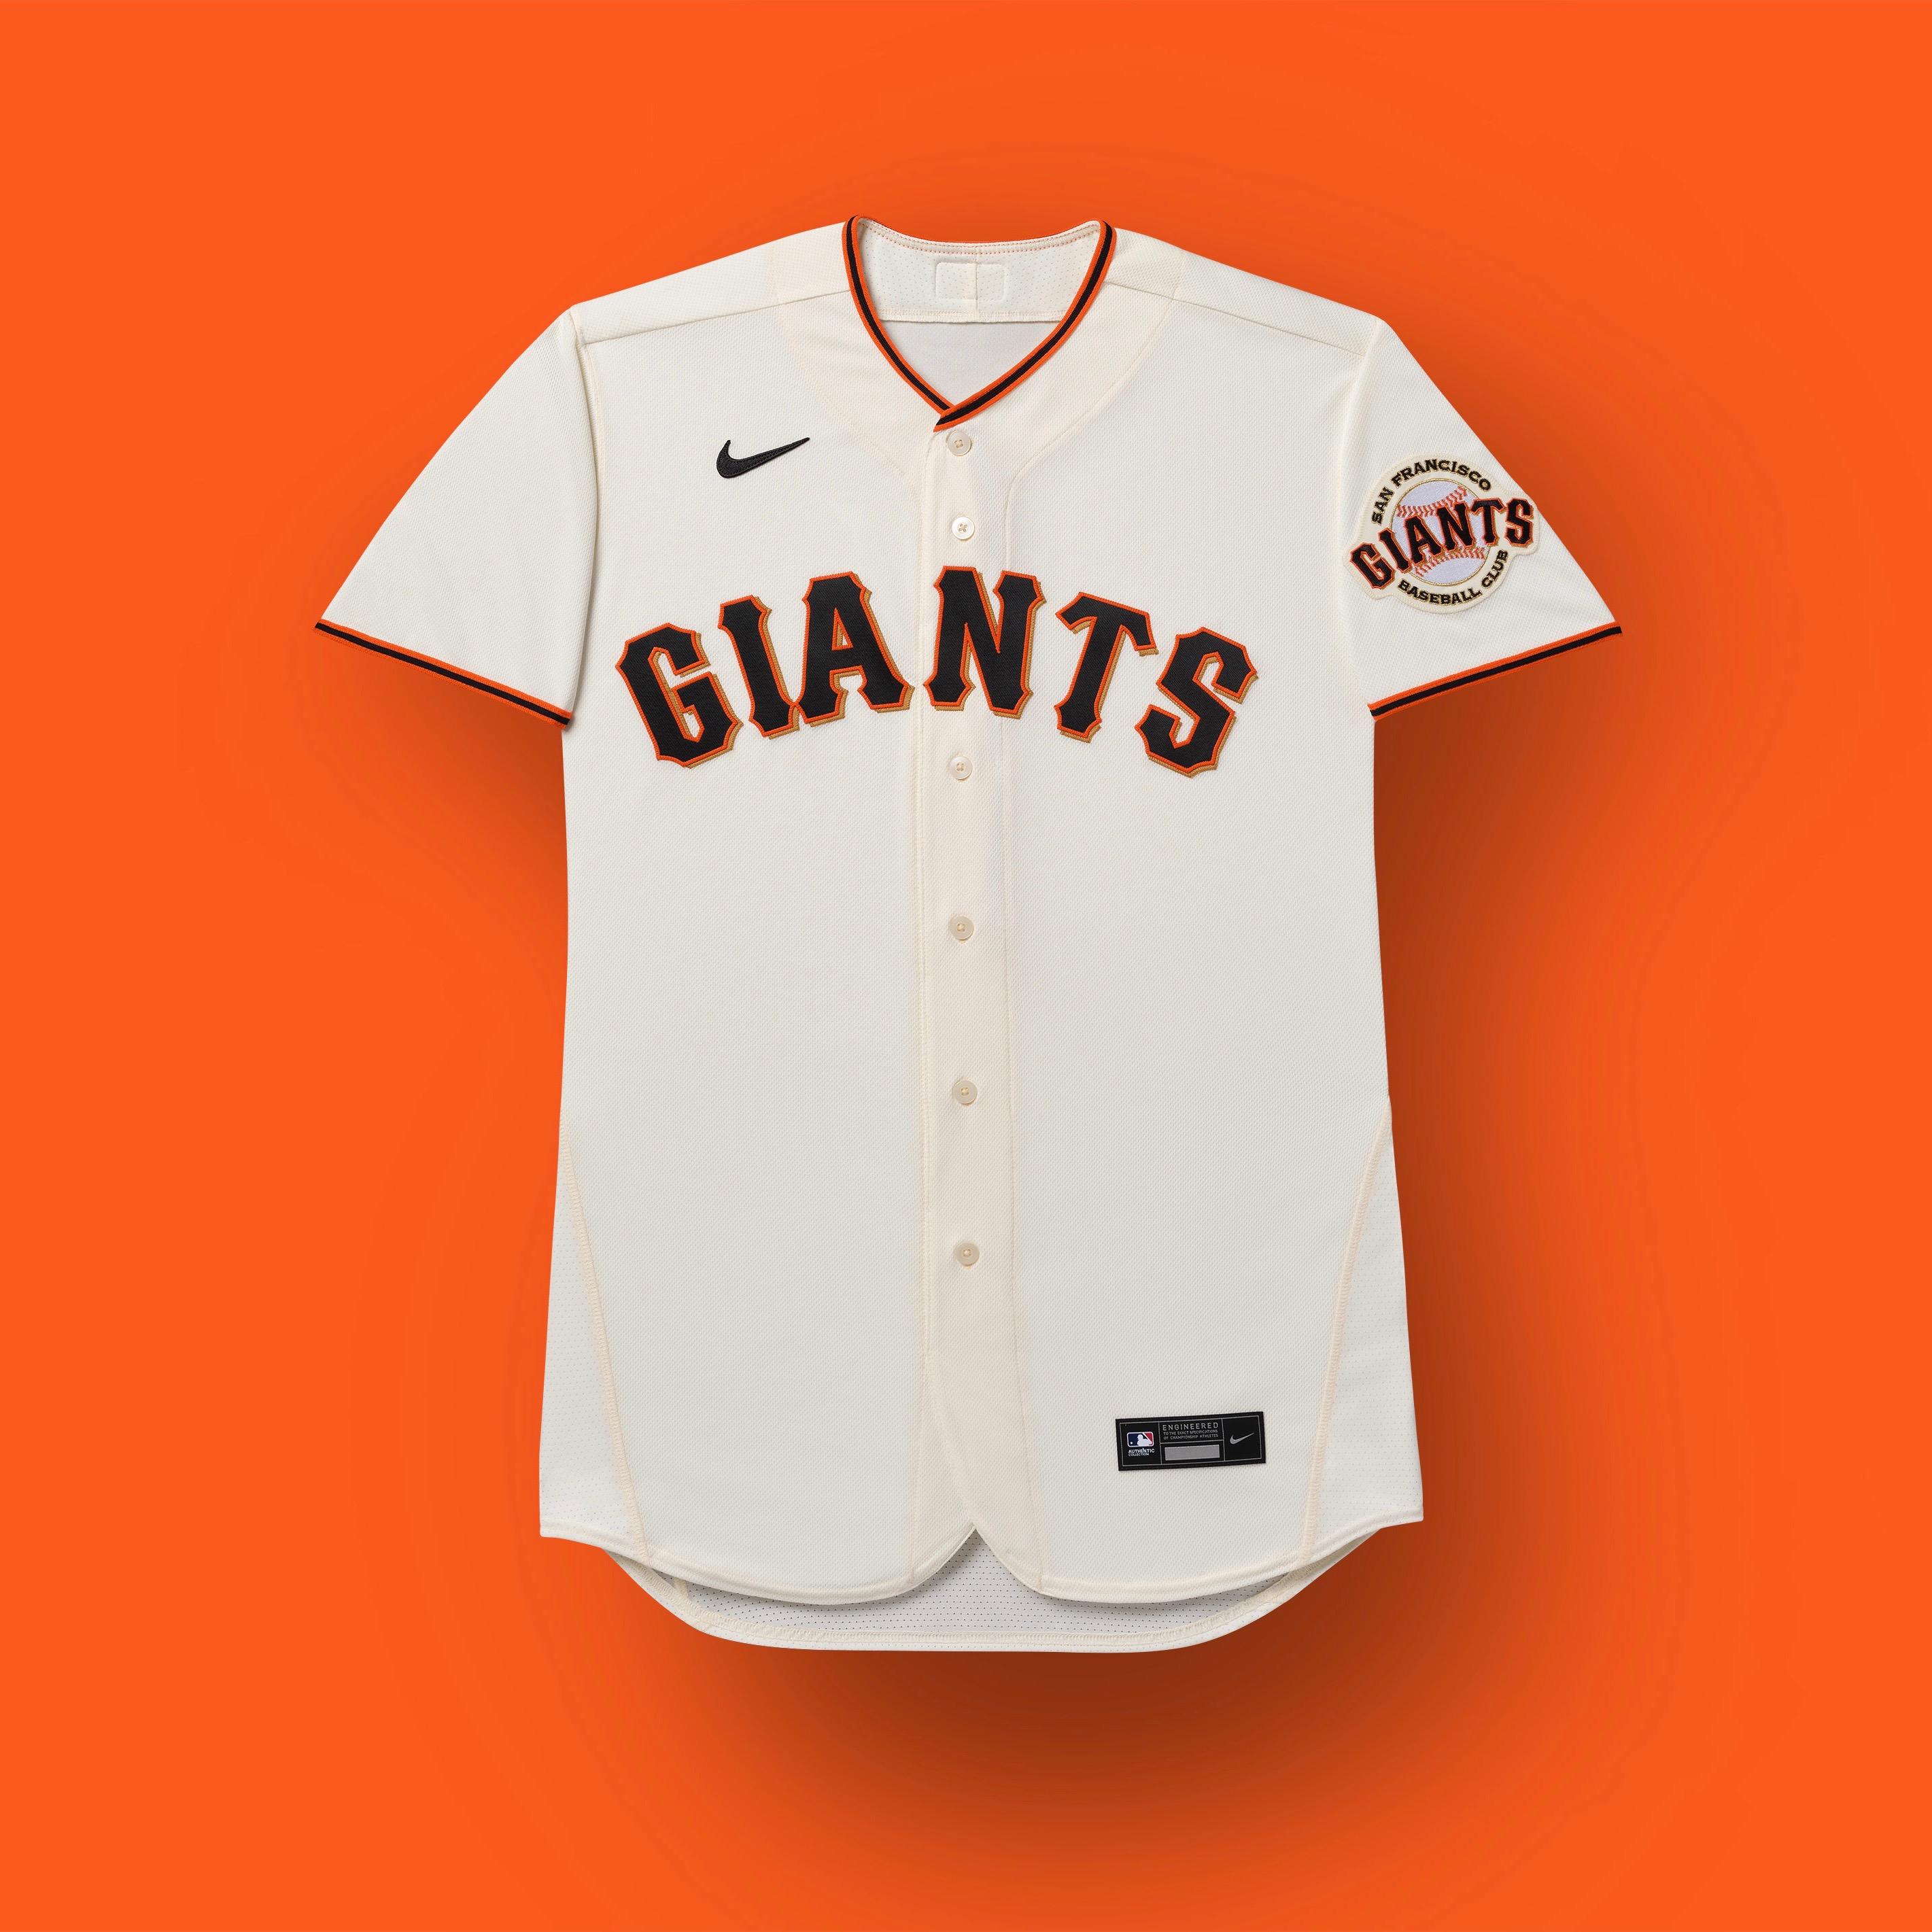 san francisco giants 2020 uniform